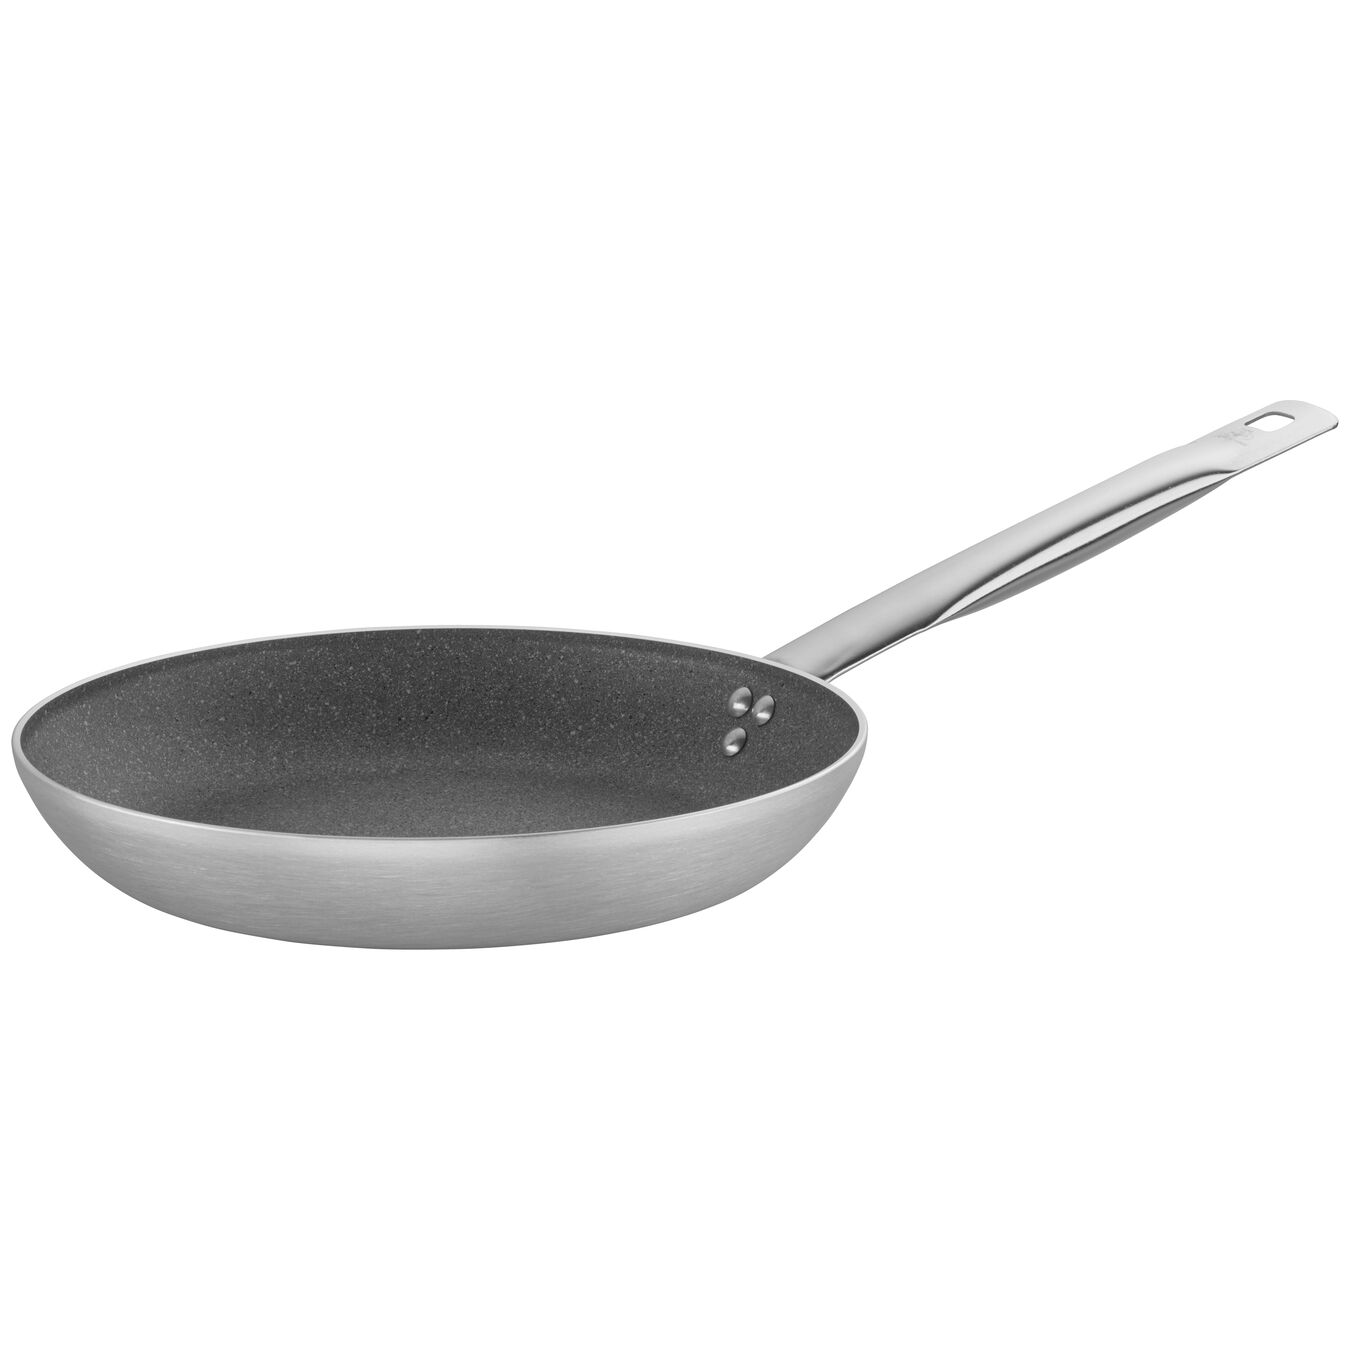 28 cm / 11 inch Aluminum Frying pan,,large 1